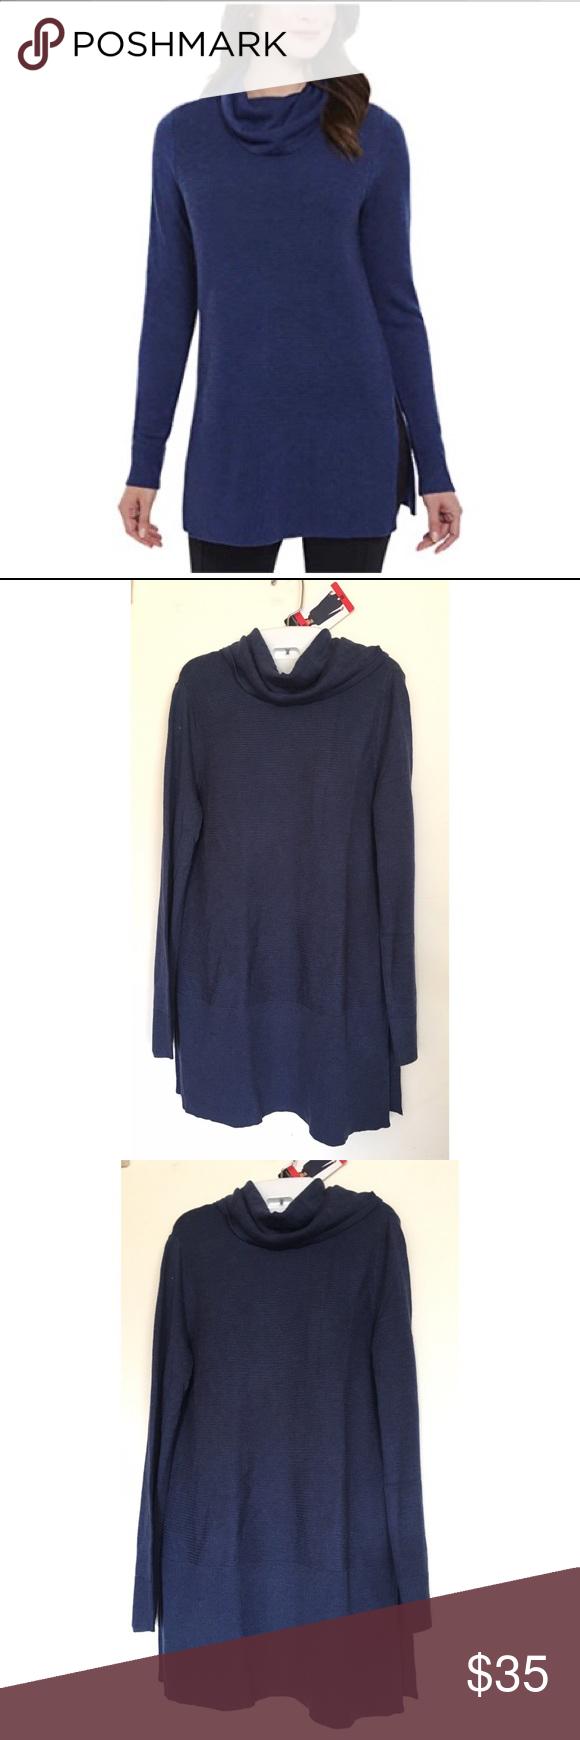 b8d49521d17 ADRIENNE VITTADINI Women s Cowl Neck Tunic Sweater ADRIENNE VITTADINI  Women s Cowl Neck Tunic Sweater Size -